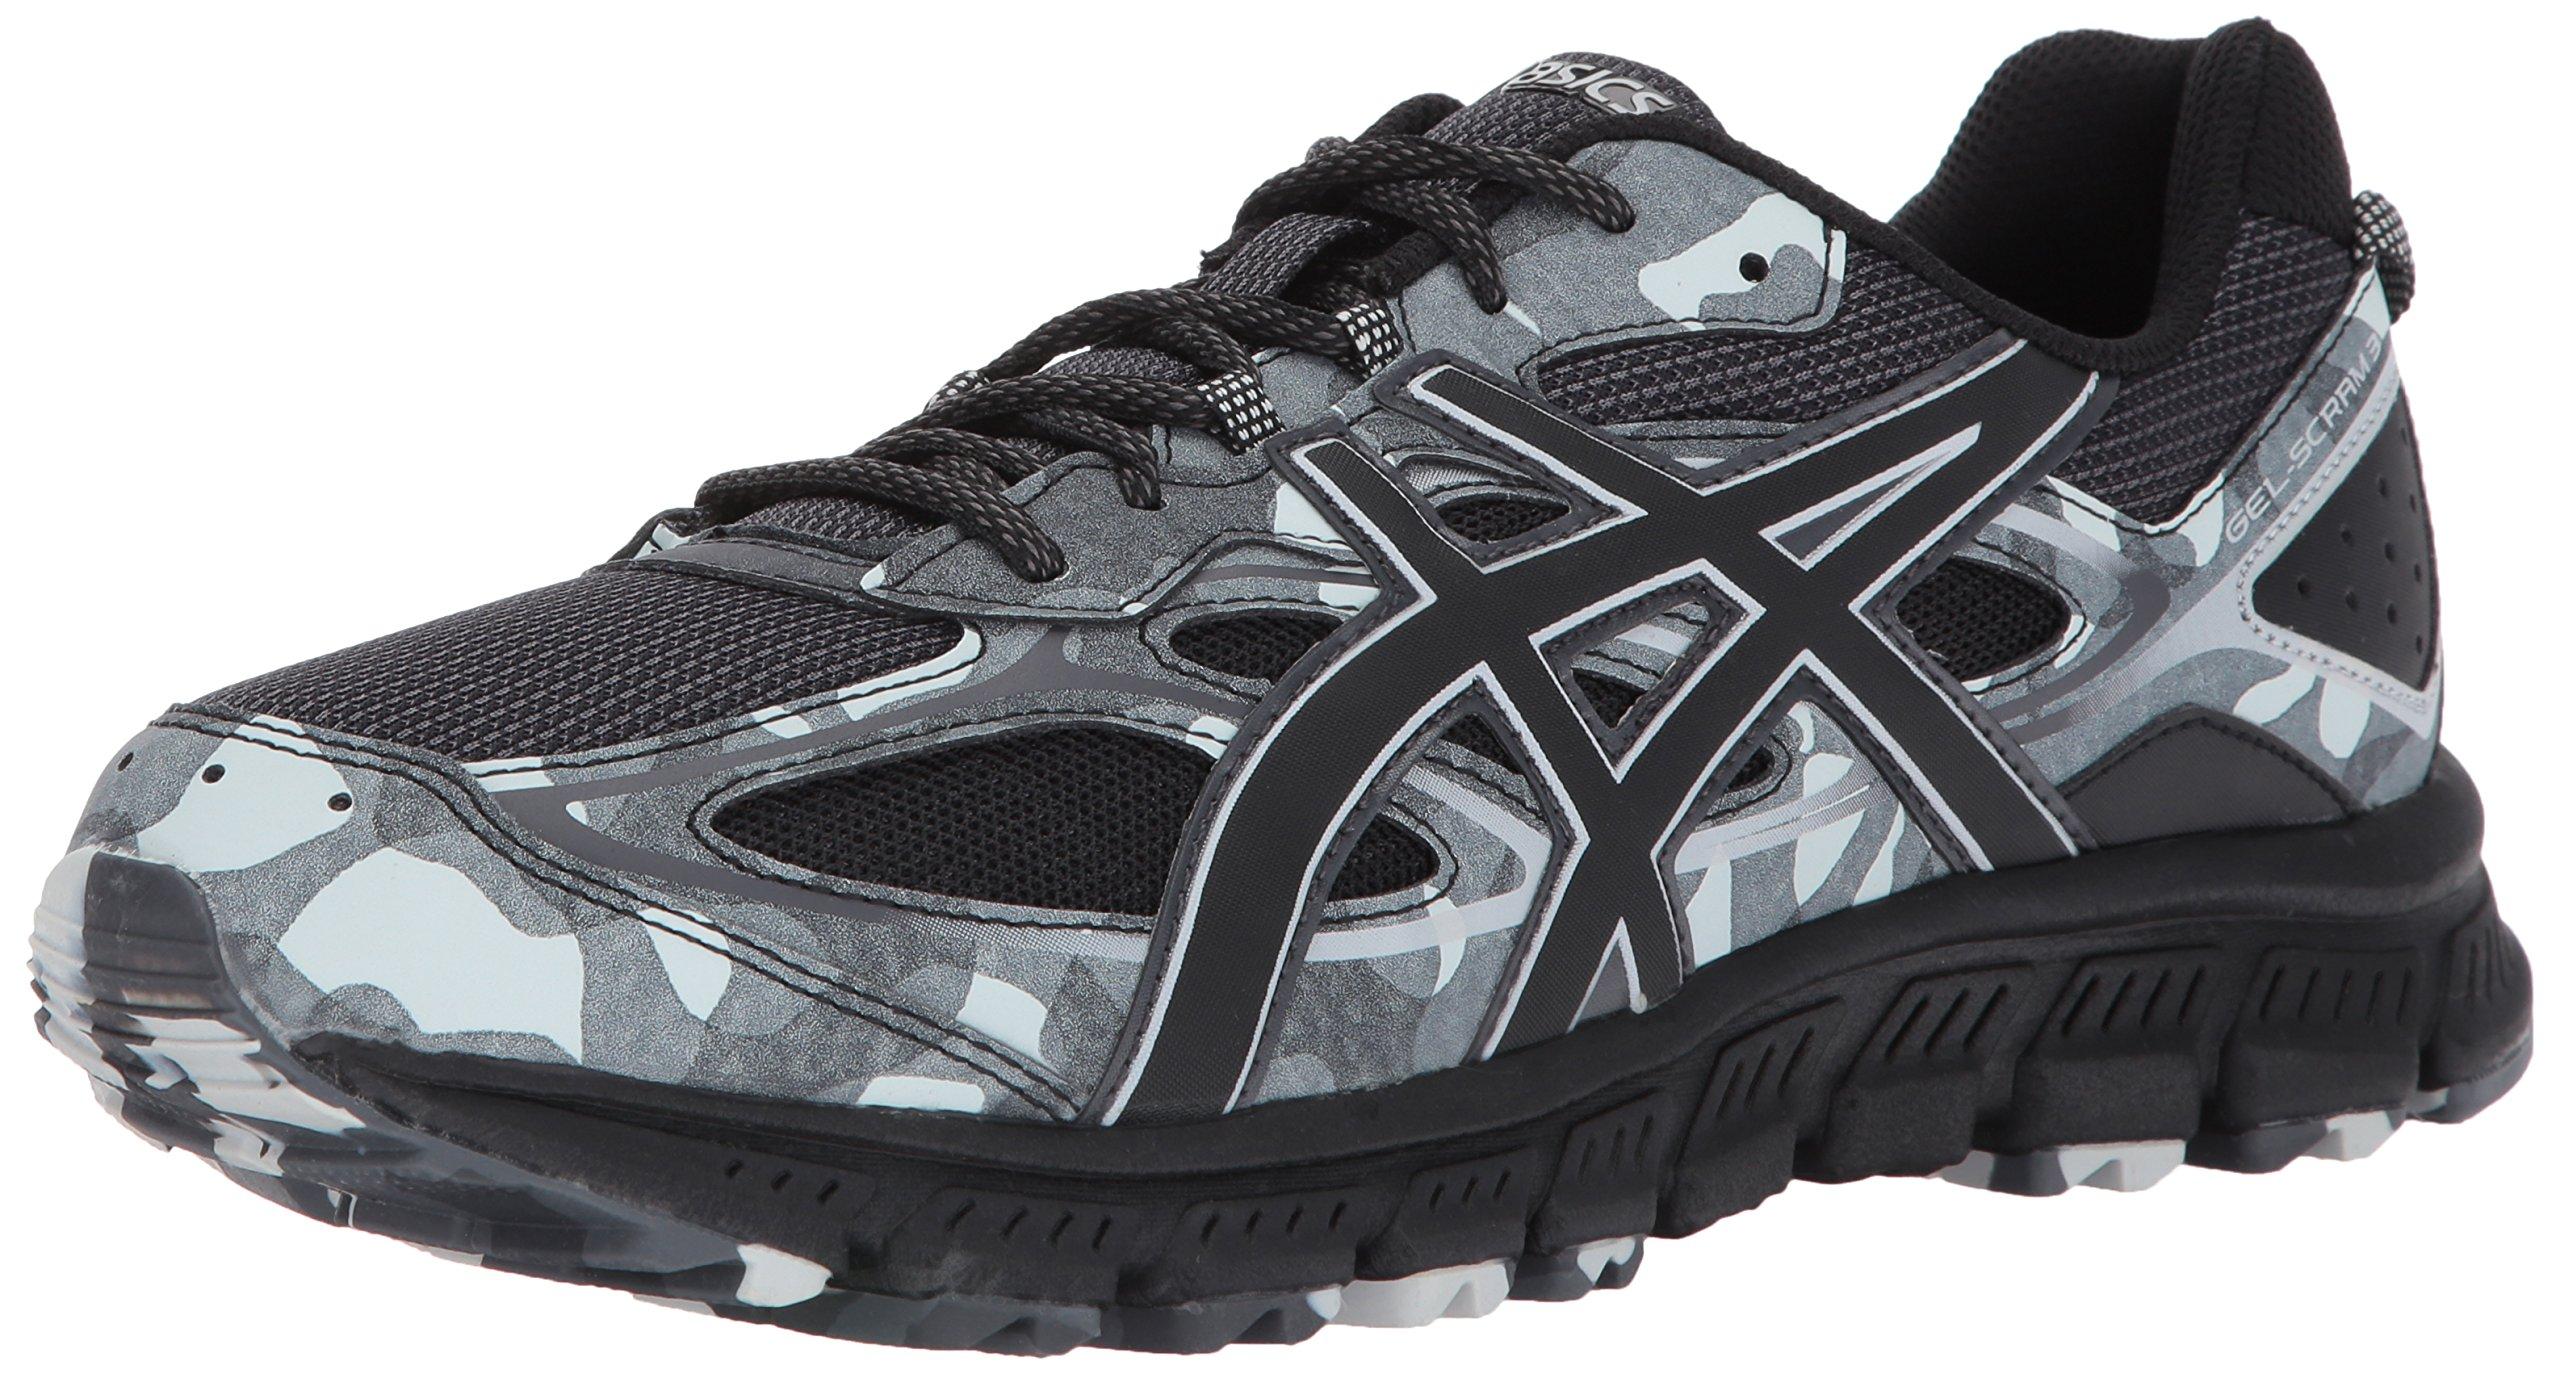 0e16b04ad5d3 ASICS Men s Gel-scram 3 Trail Runner - GEL-Scram 3-M   Running Shoes ...